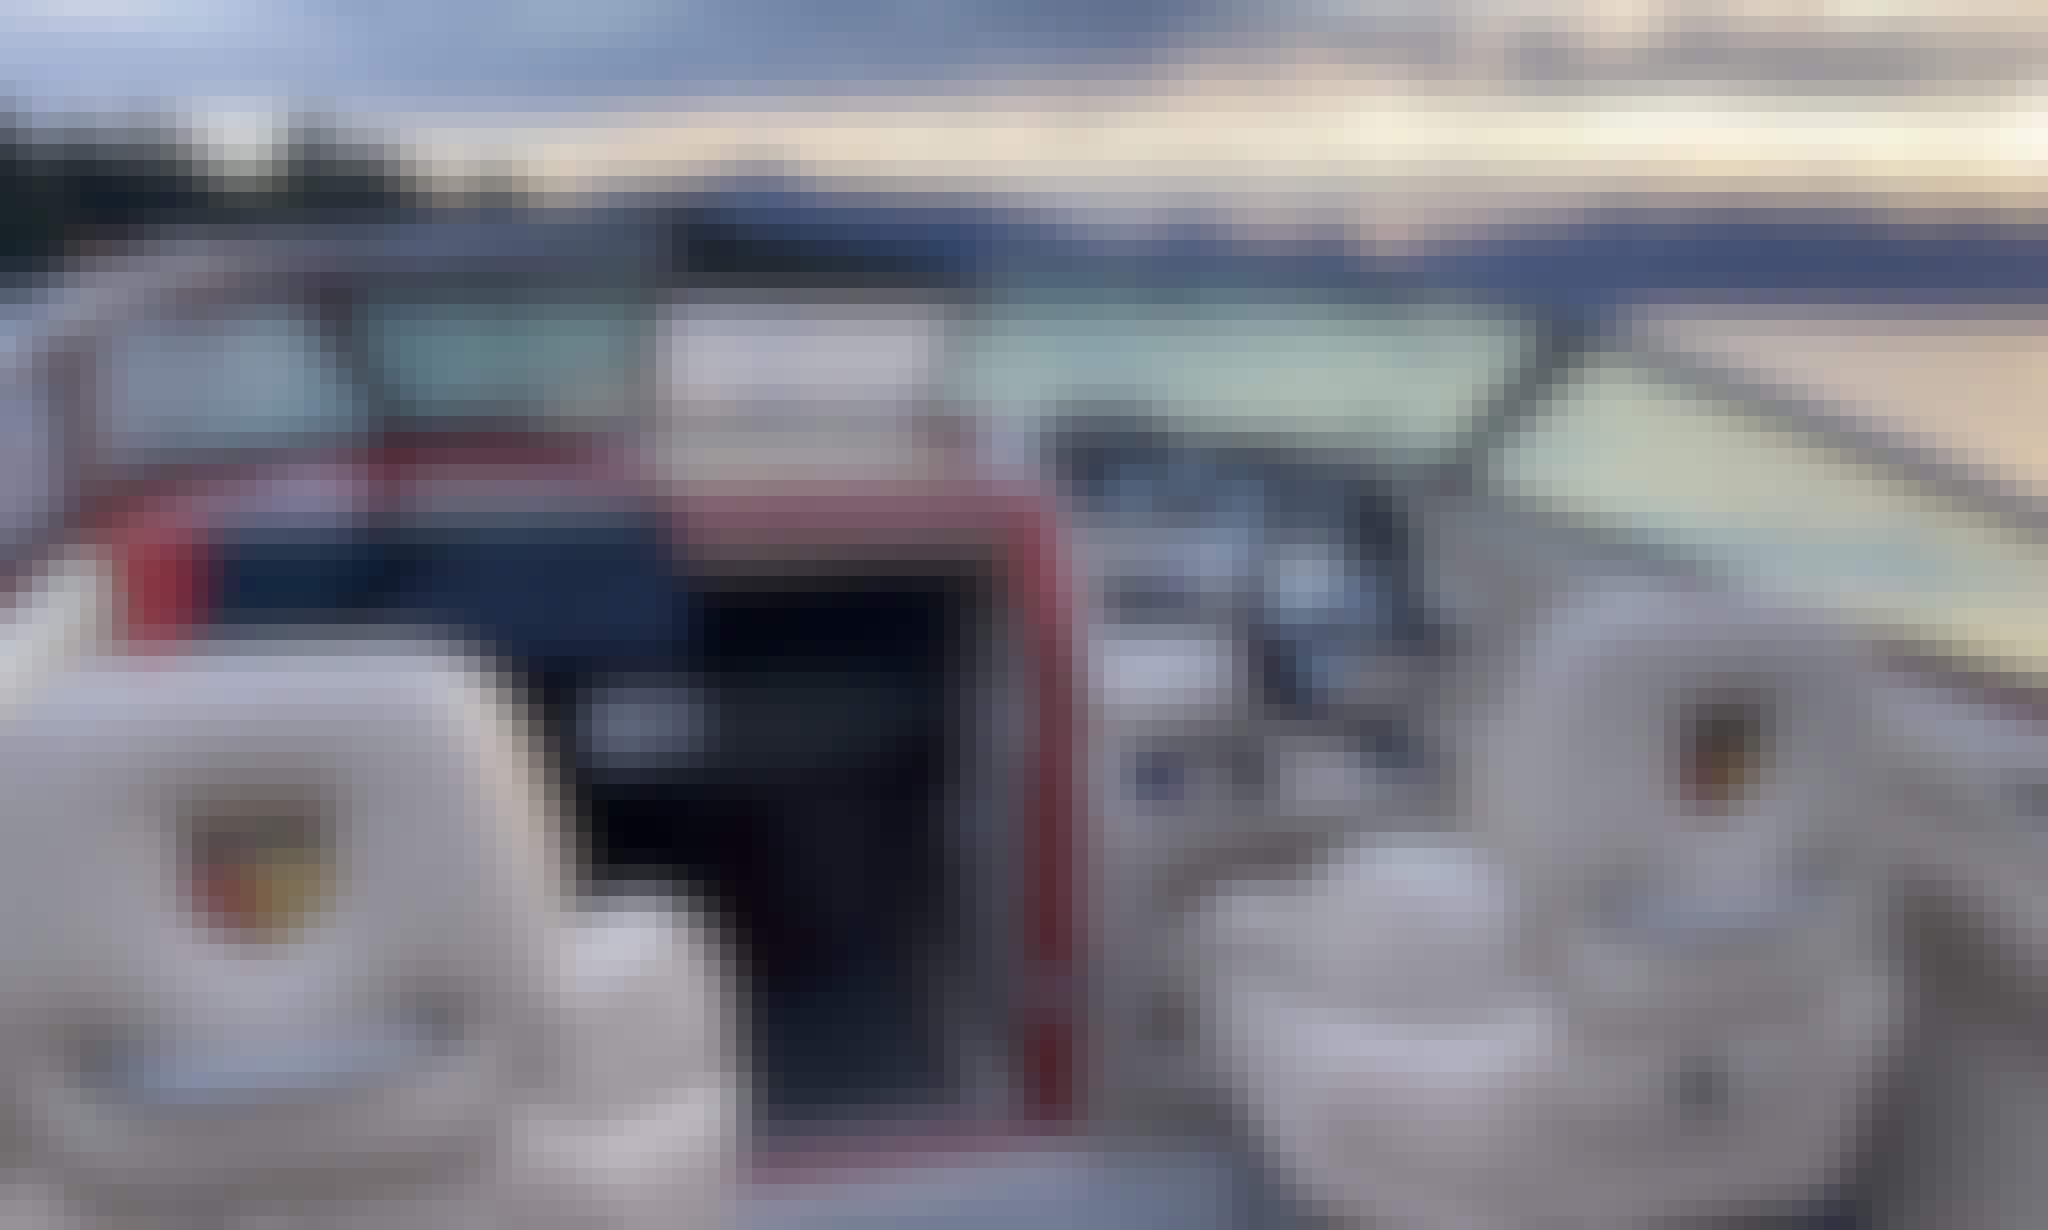 Ferrari Red Powerboat for Rent in South Lake Tahoe